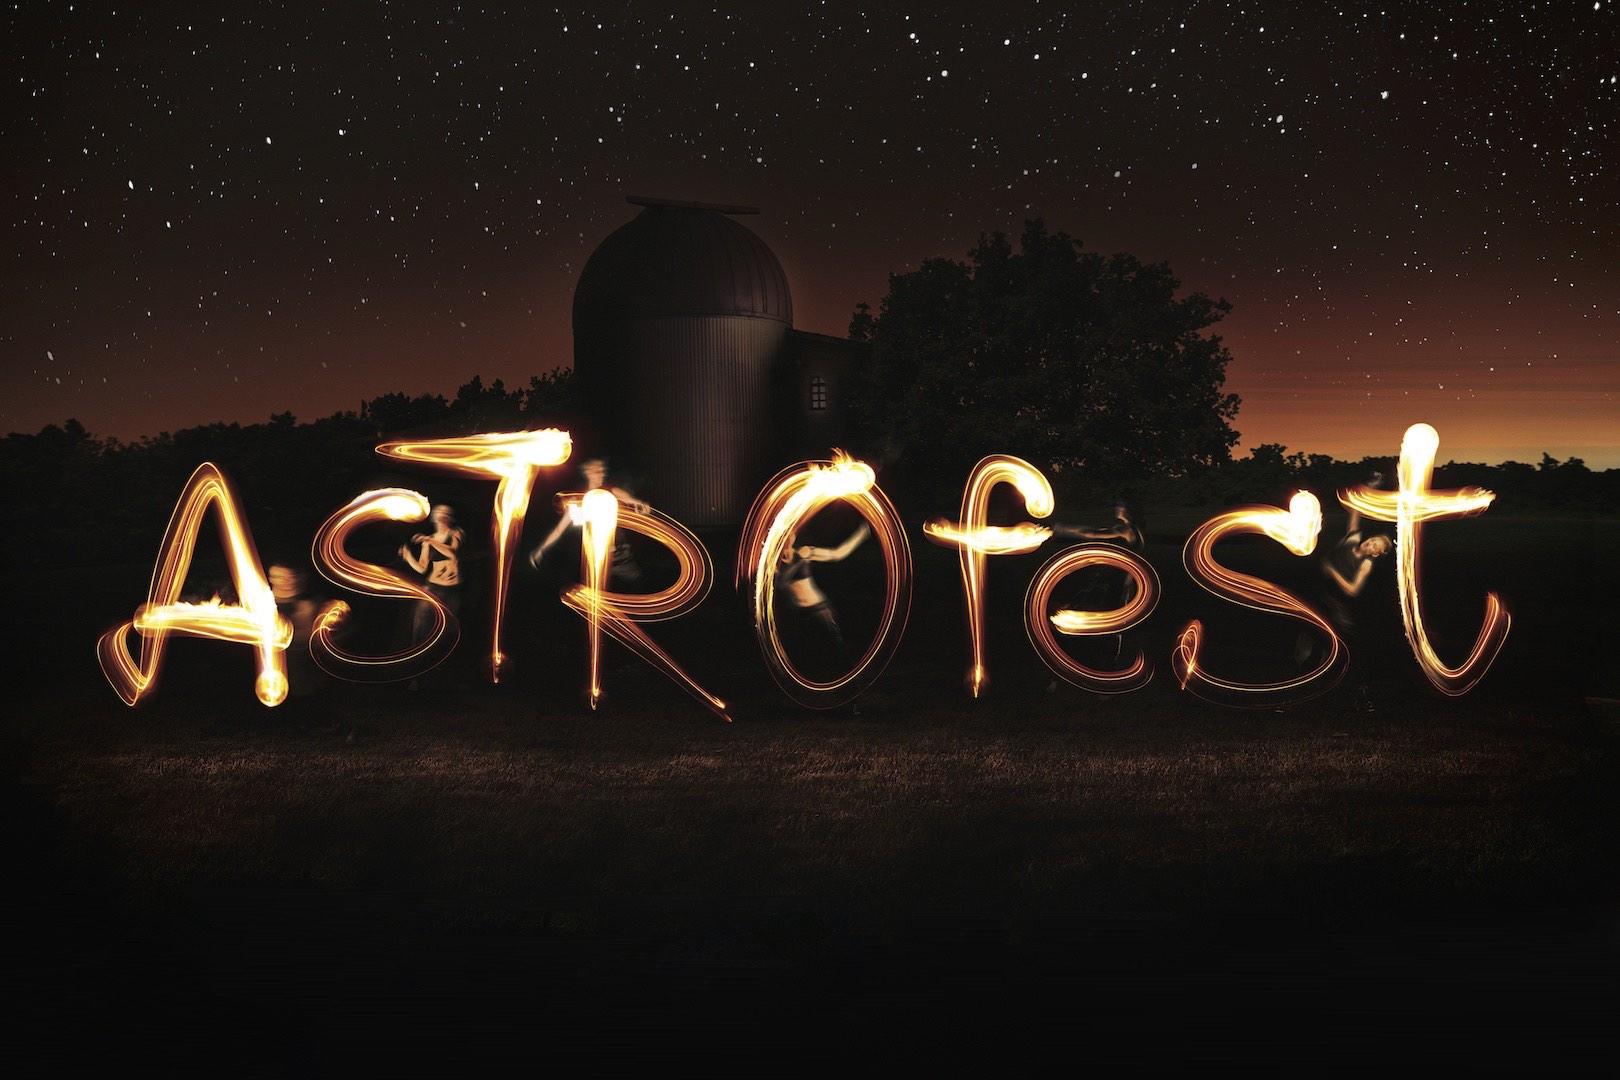 Astrofest 2017